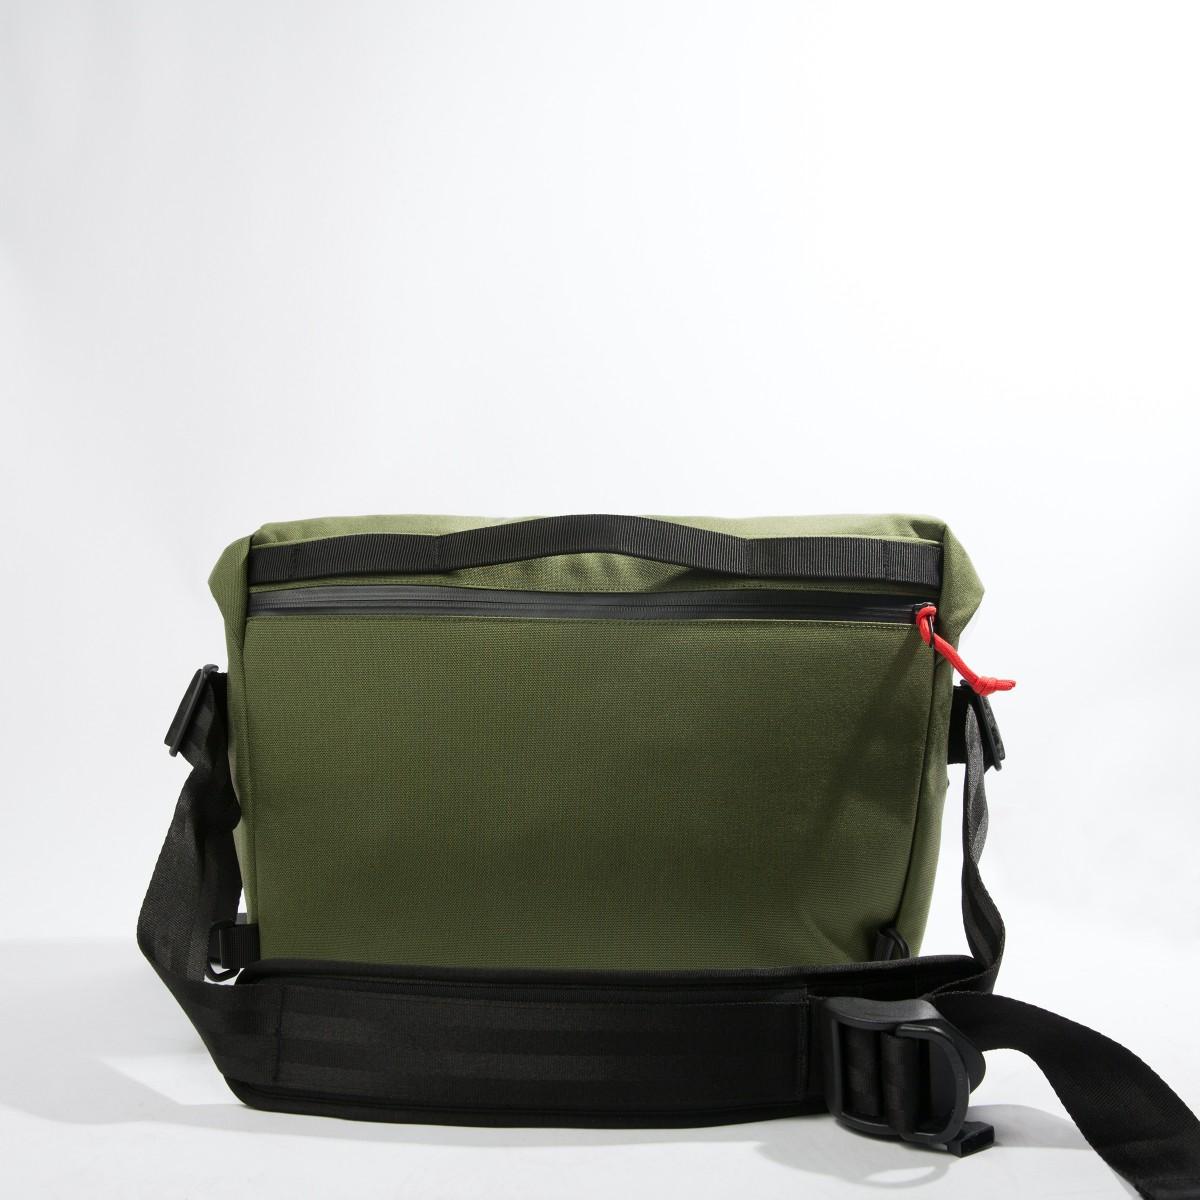 Designs Bag Topo Laukku Messenger Mukama yY6f7bgv